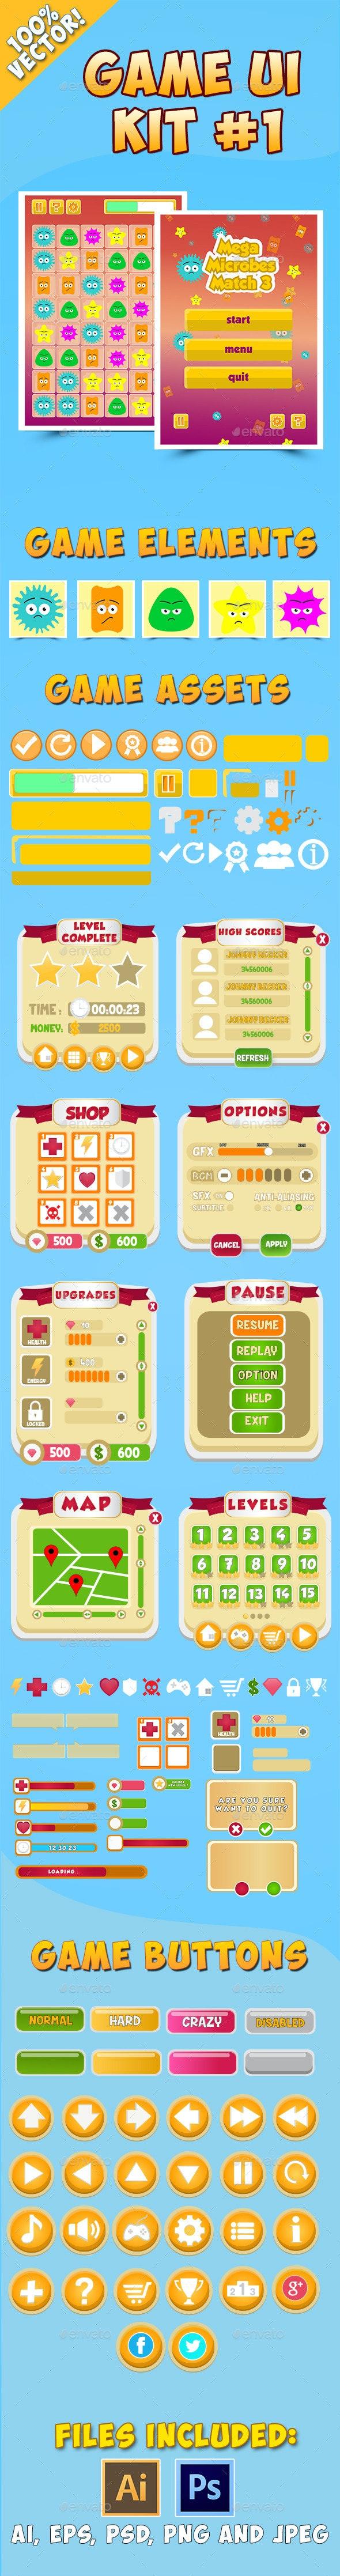 Game UI Kit #1 by globeweb   GraphicRiver